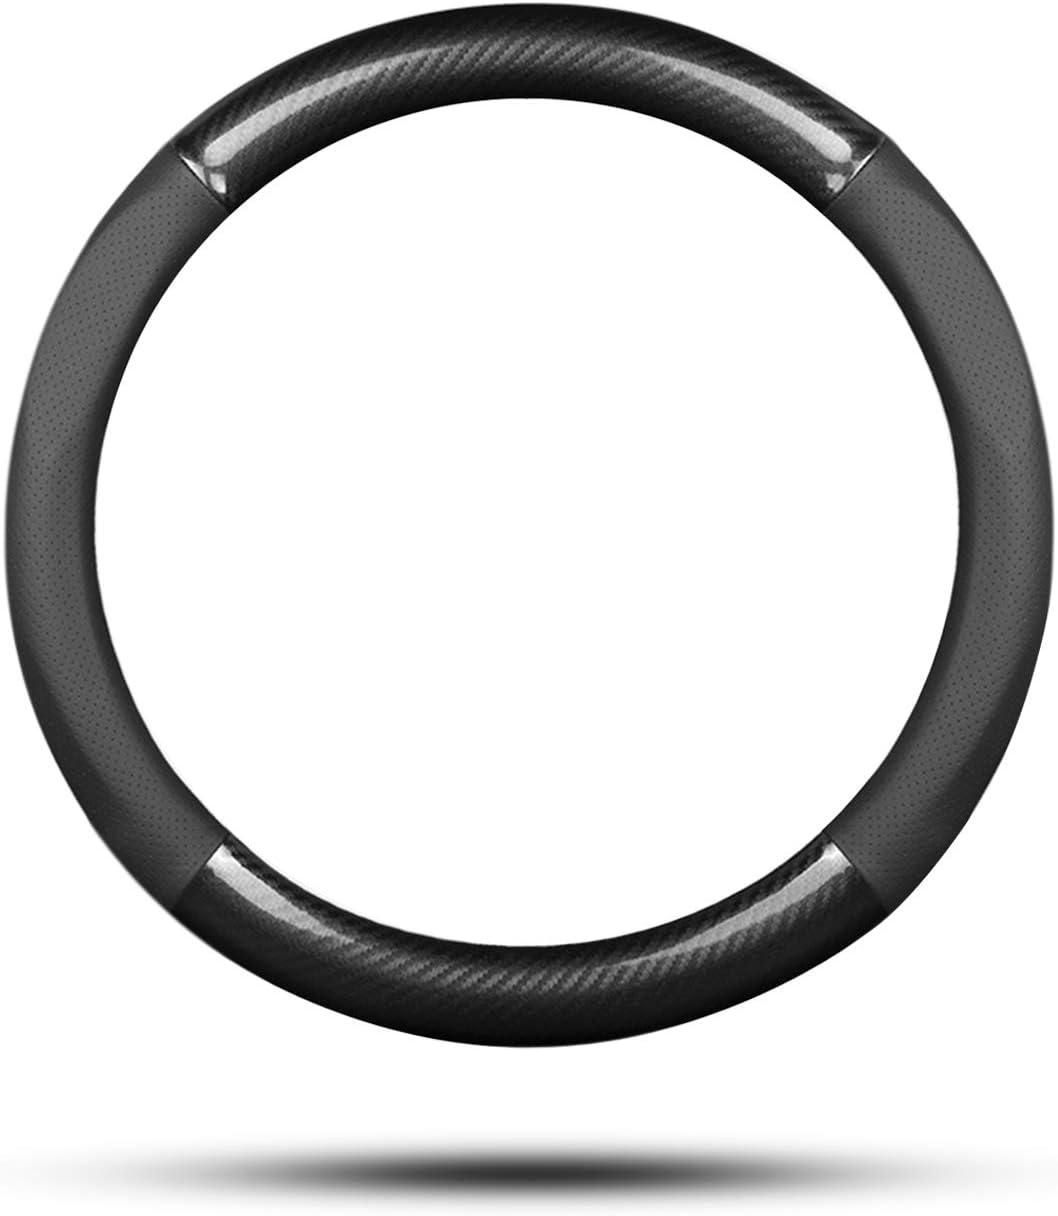 15 Negro Ergocar Funda Volante De Coche Antideslizante Volante De Coche Protector Deporte Fibra de Carbono /& Cuero PU Para Di/ámetro 38cm